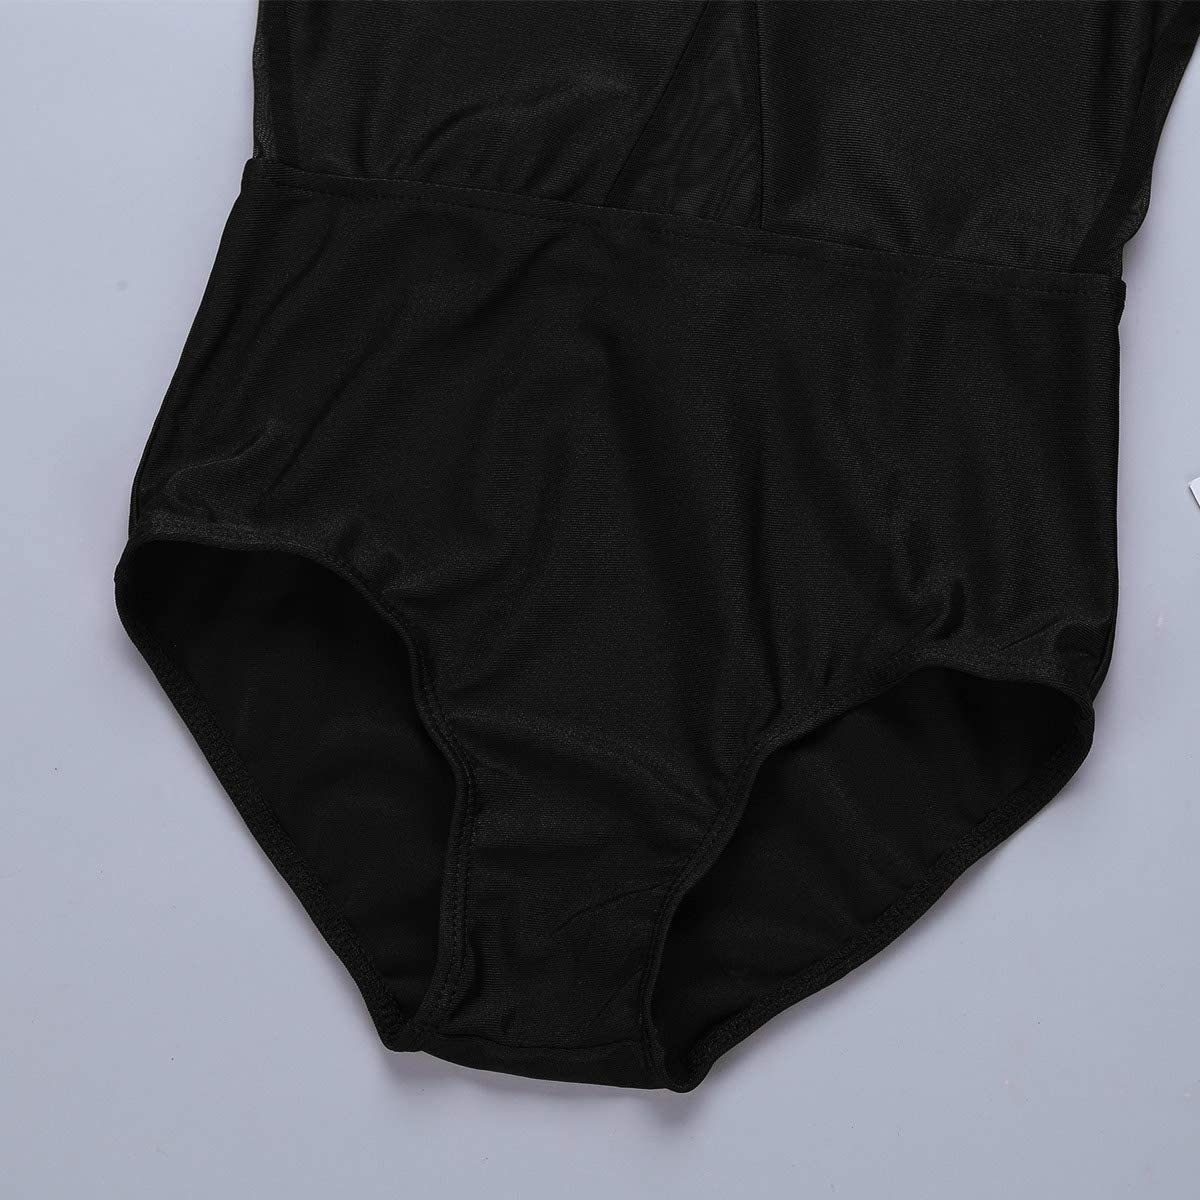 JEATHA Kids Girls Sleeveless Mesh Splice Ballet Dance Bodysuit Keyhole Cutout Back Gym Sports Workout Leotard